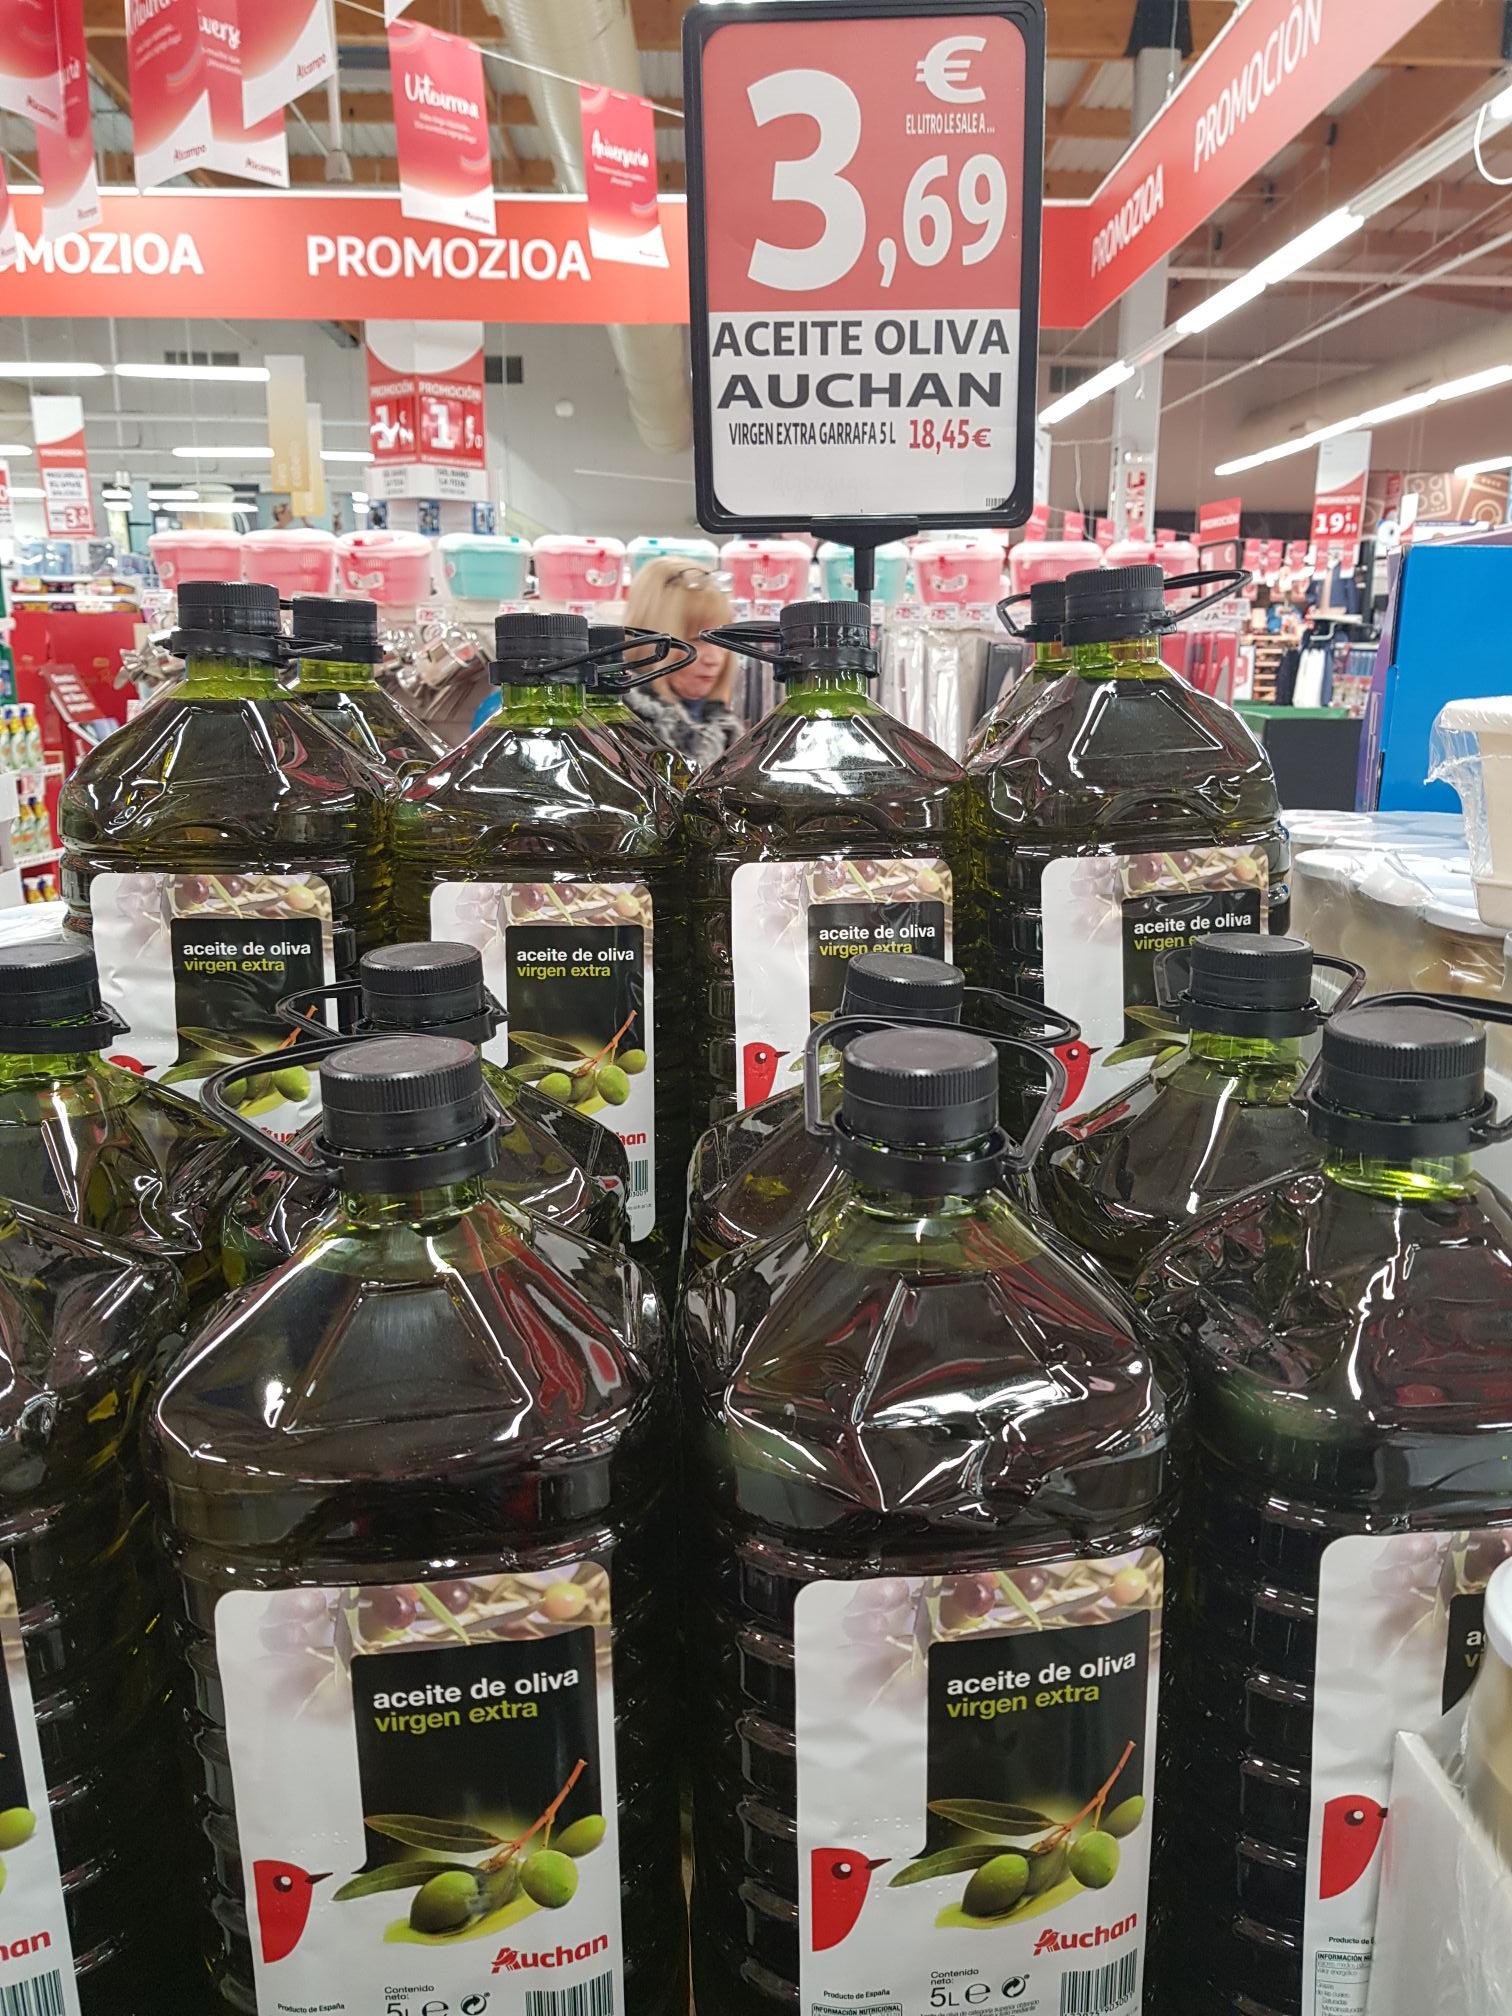 Aceite de oliva virgen extra Auchan , Alcampo de Mungia